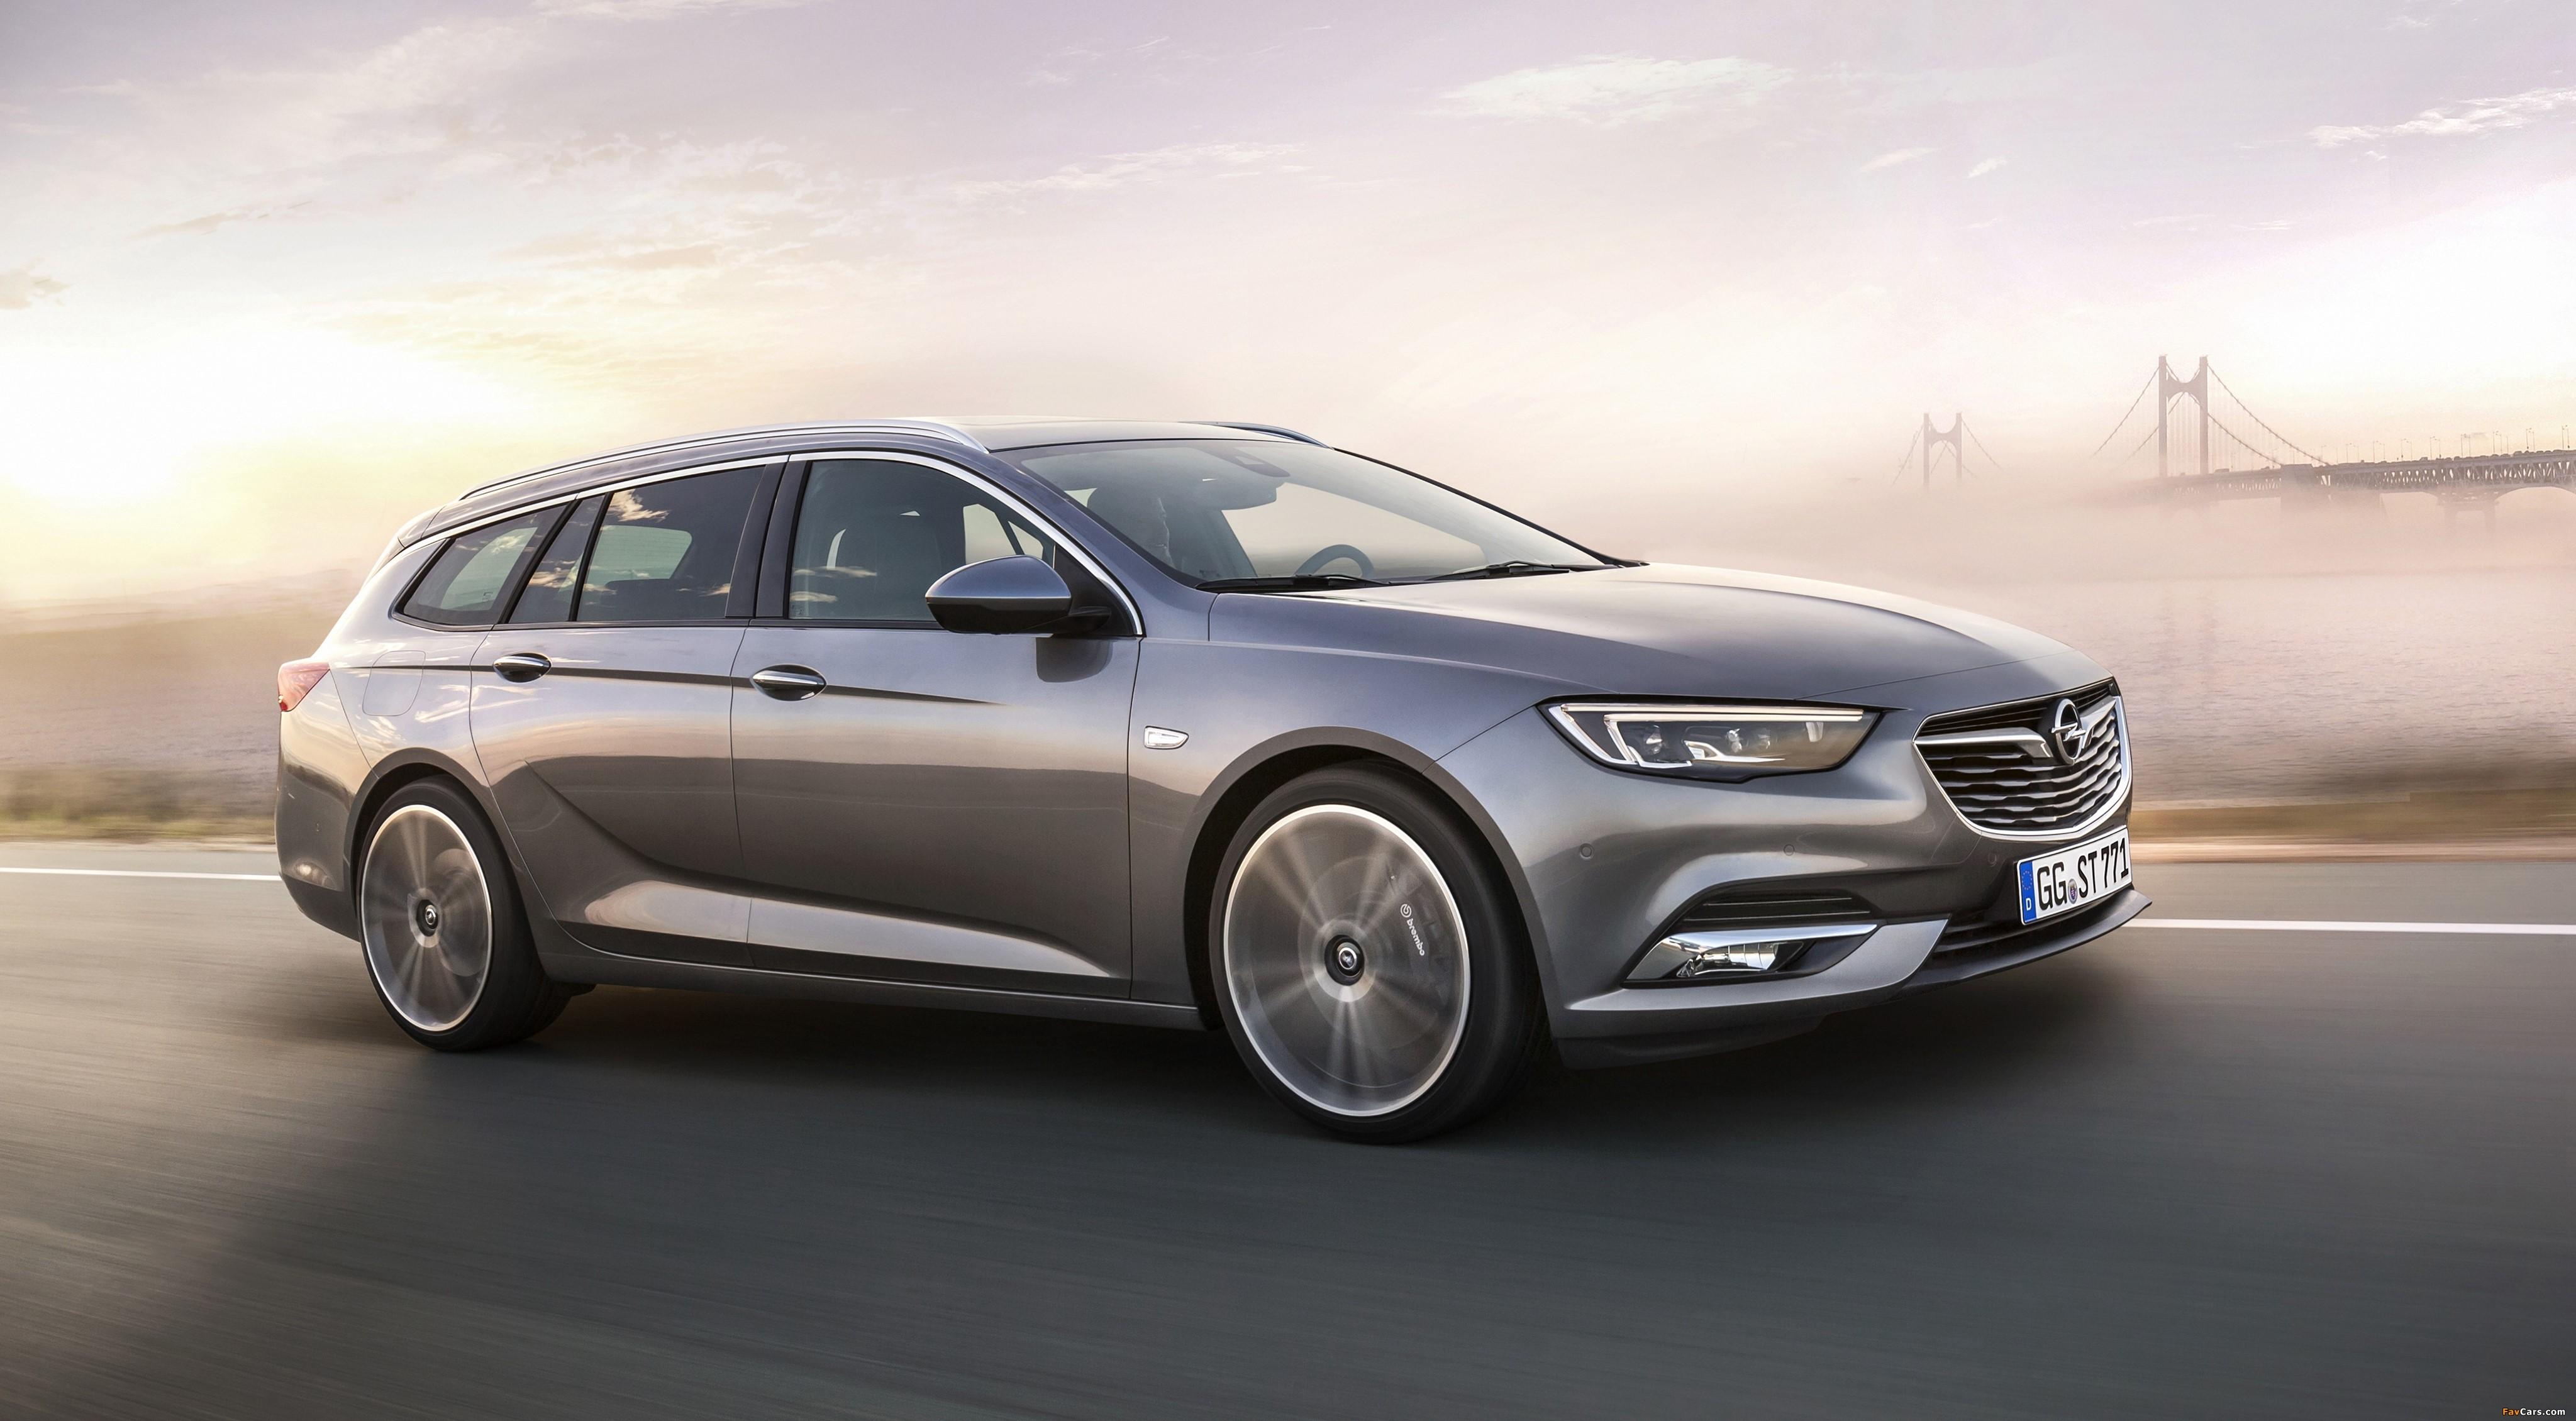 Opel Konfigurator-Erstelle dein Traumauto- Opel Neuwagen konfigurieren